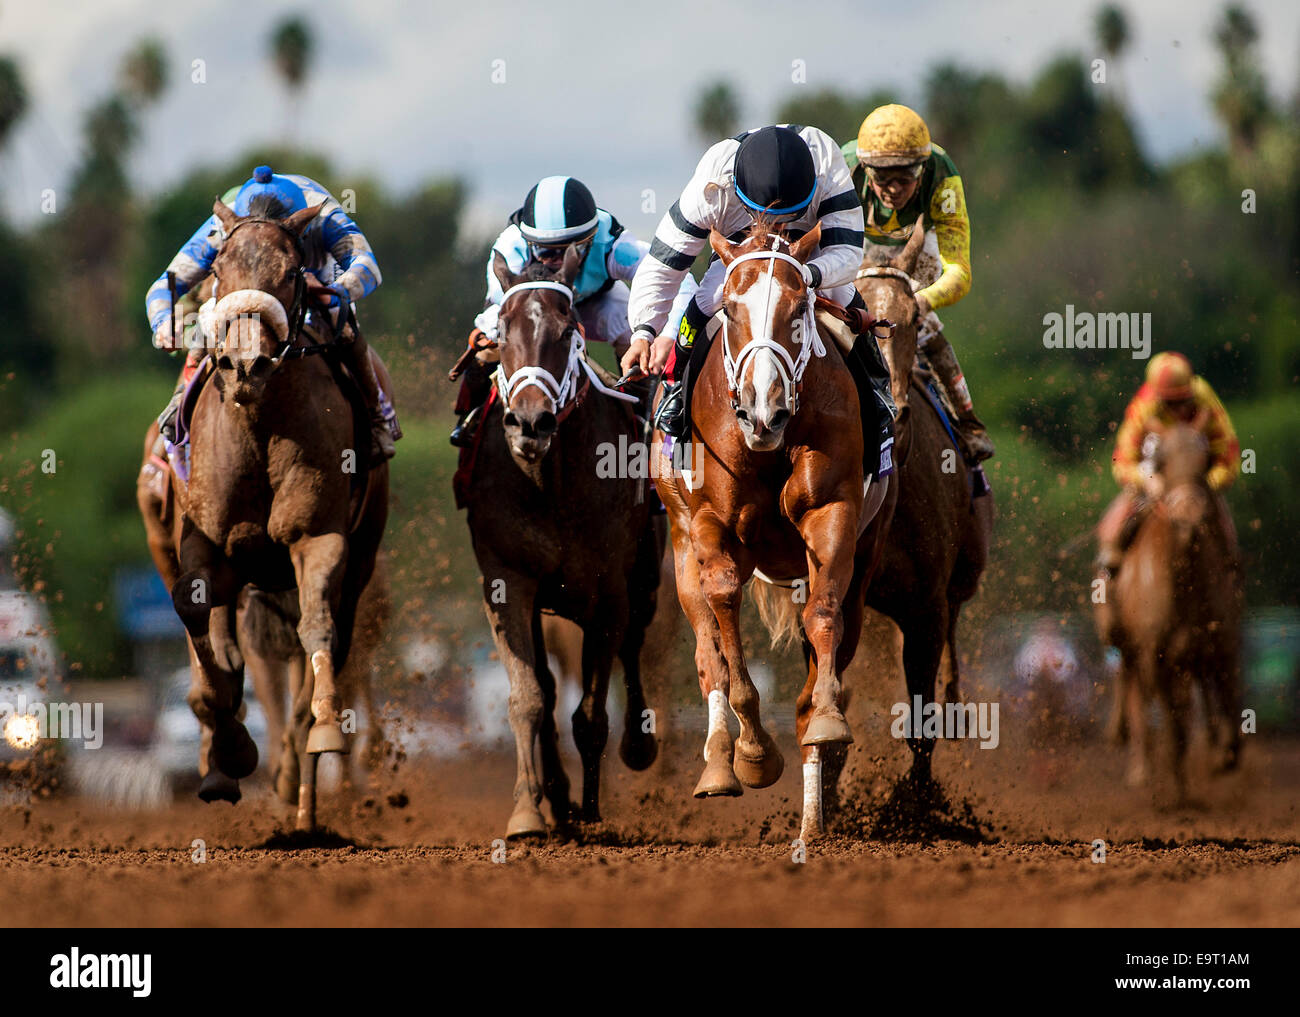 Arcadia, CA, USA. 2nd Nov, 2014. November 01 2014: Take Charge Brandi, ridden by Victor Espinoza and trained by Stock Photo